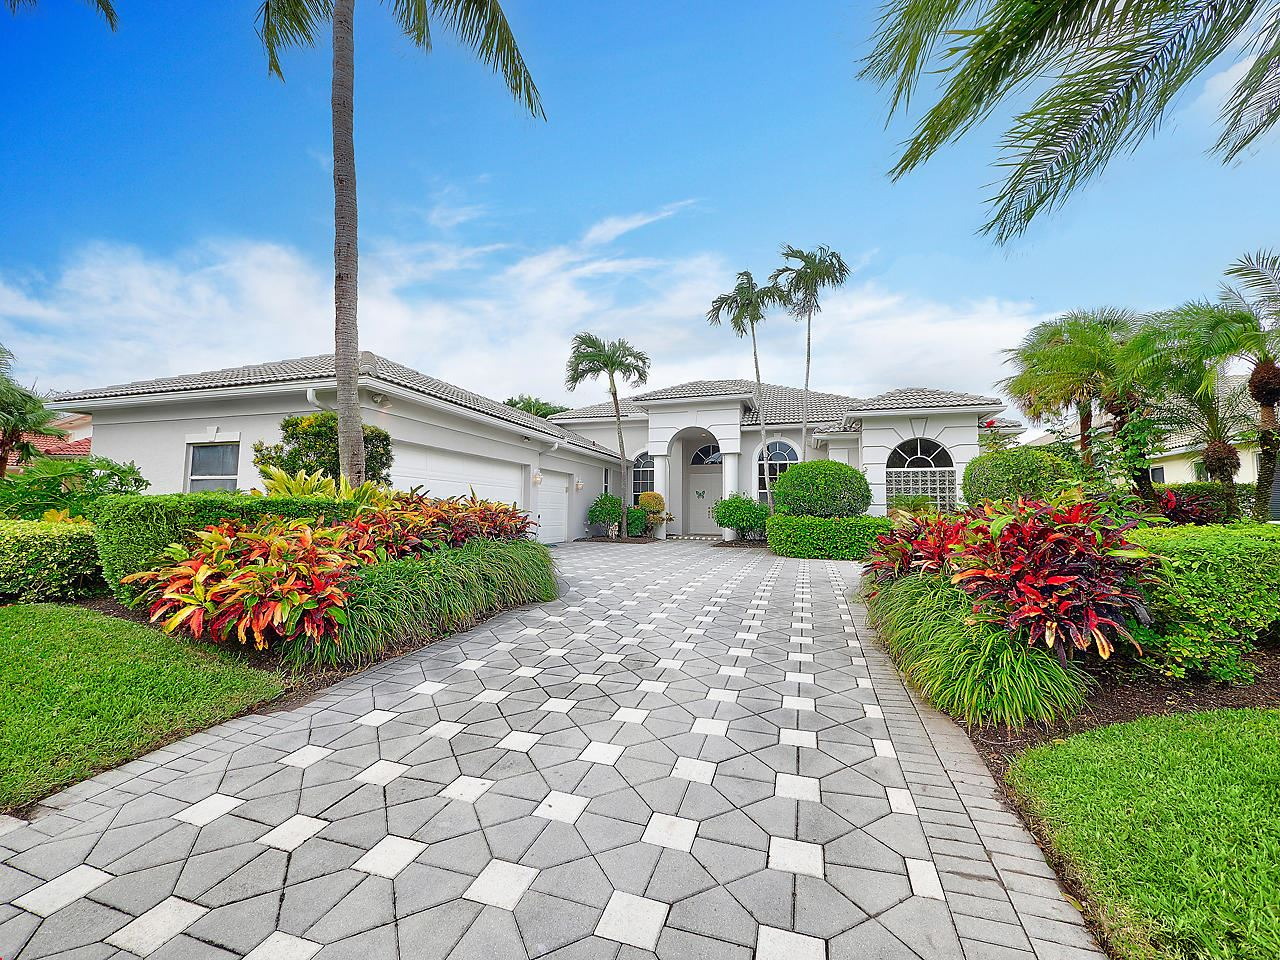 Photo of 22 Bermuda Lake Drive, Palm Beach Gardens, FL 33418 (MLS # RX-10670017)